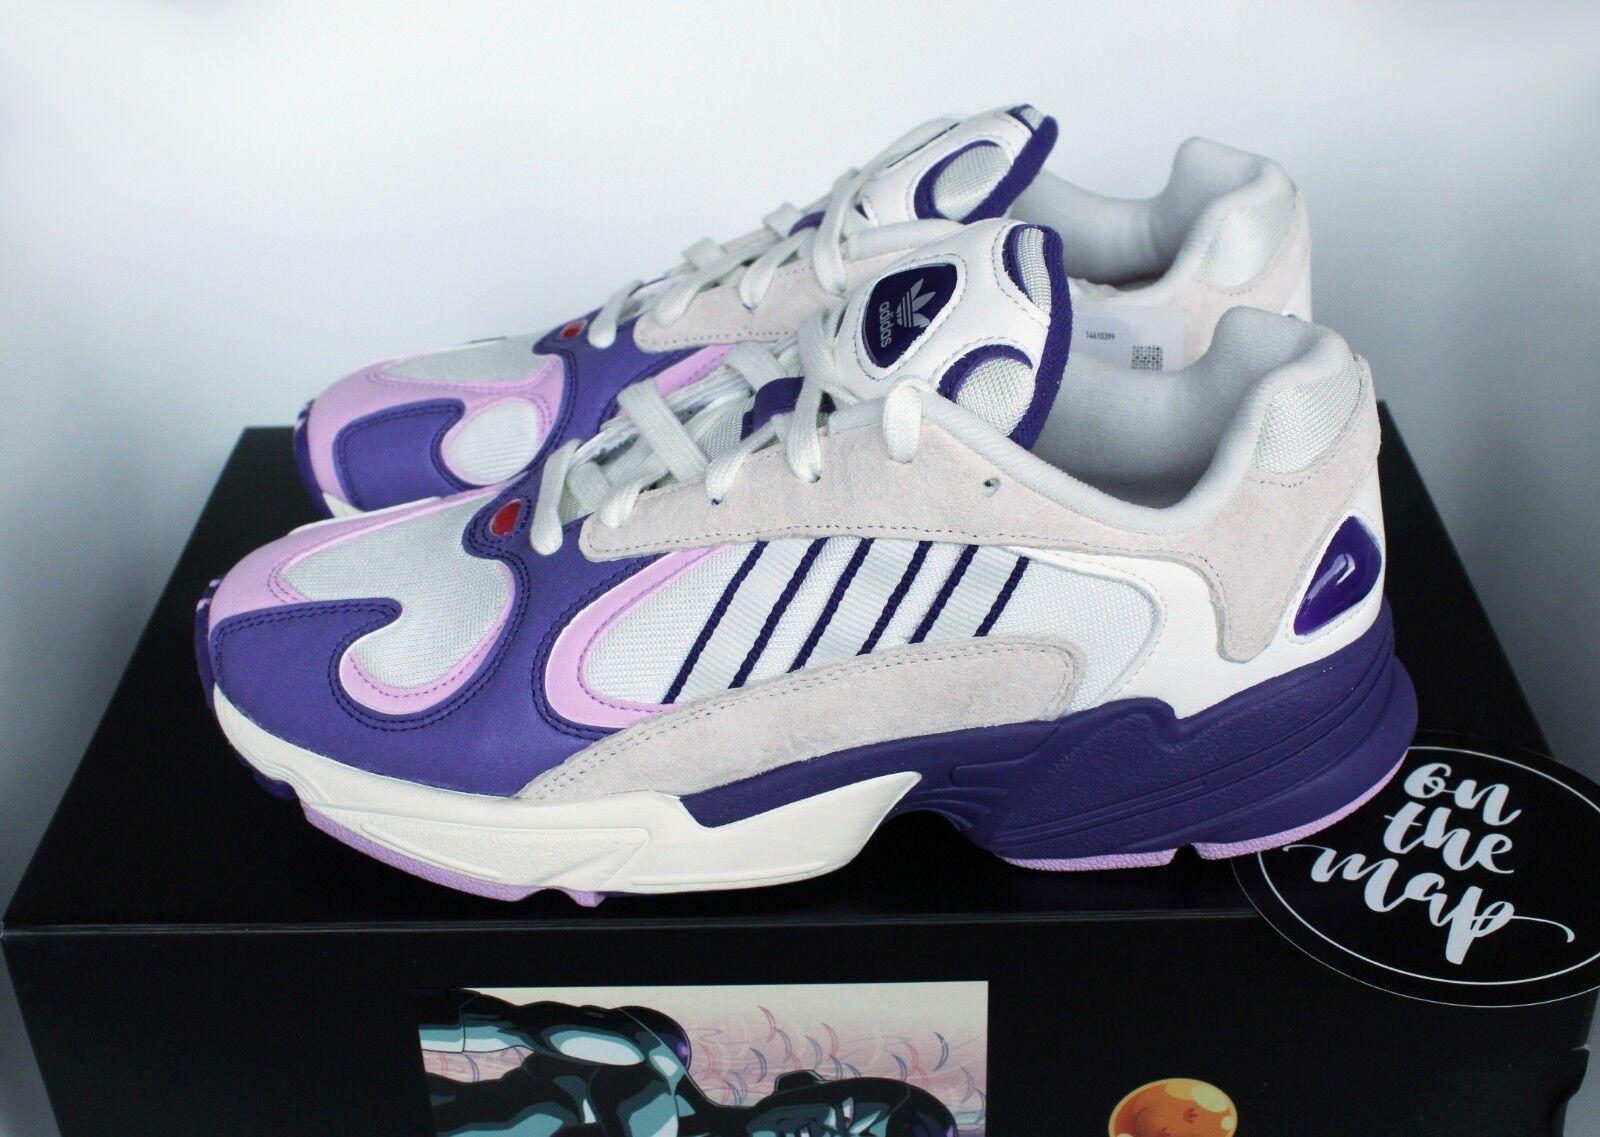 Adidas Dragon Ball Z Yung Frieza Morada blancoa 1 Yung - 1 Nuevo